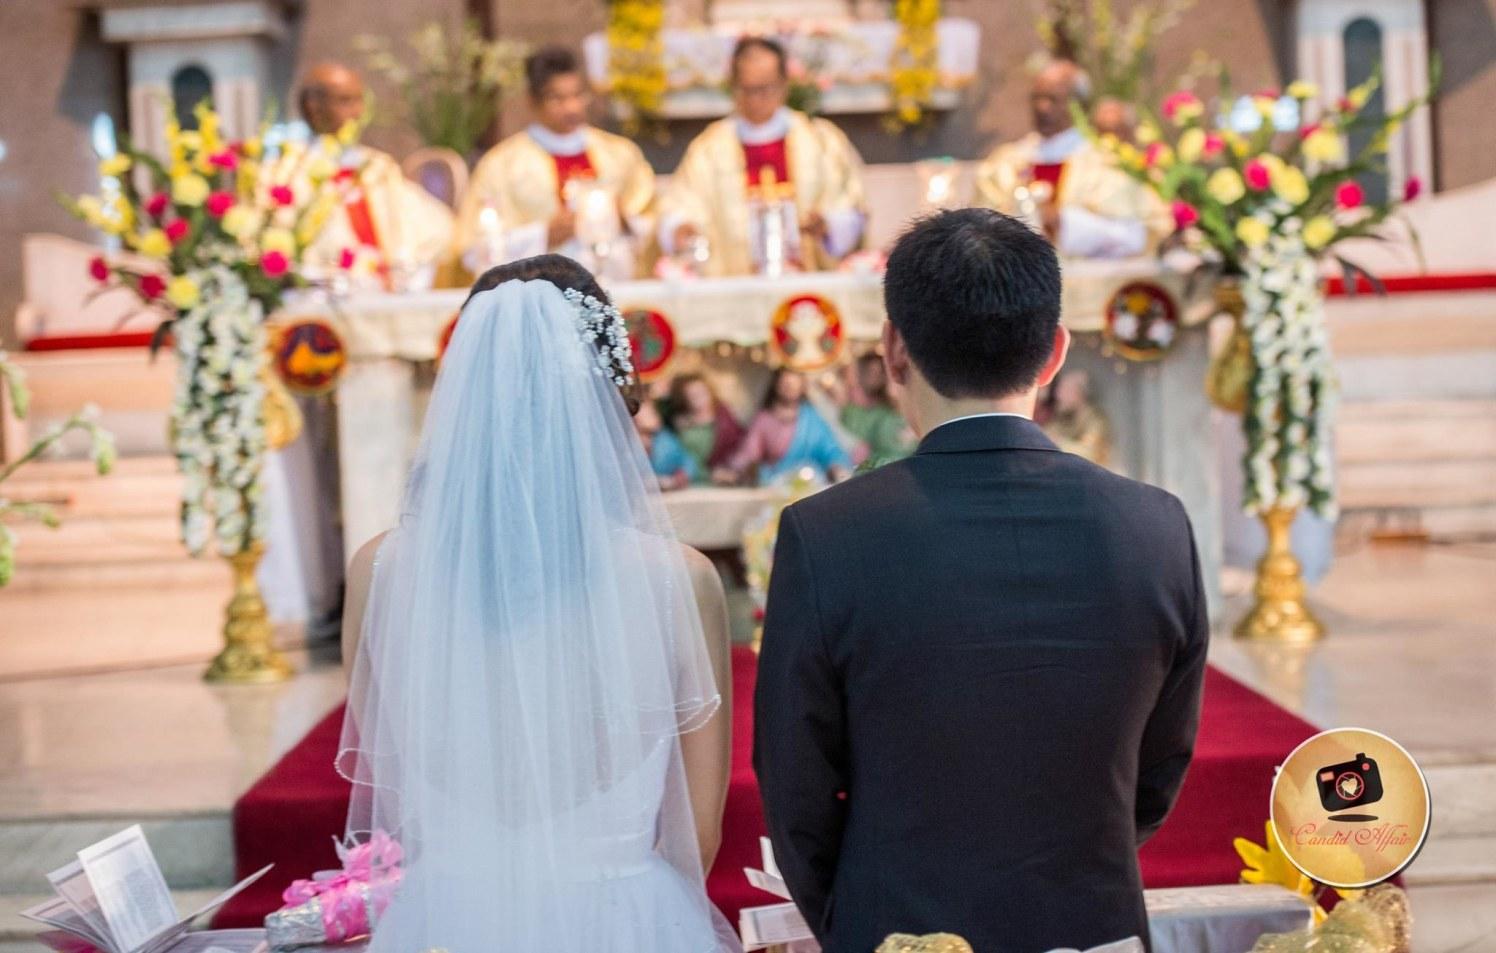 Christian Wedding Day Rituals by Candid Affair Wedding-photography | Weddings Photos & Ideas